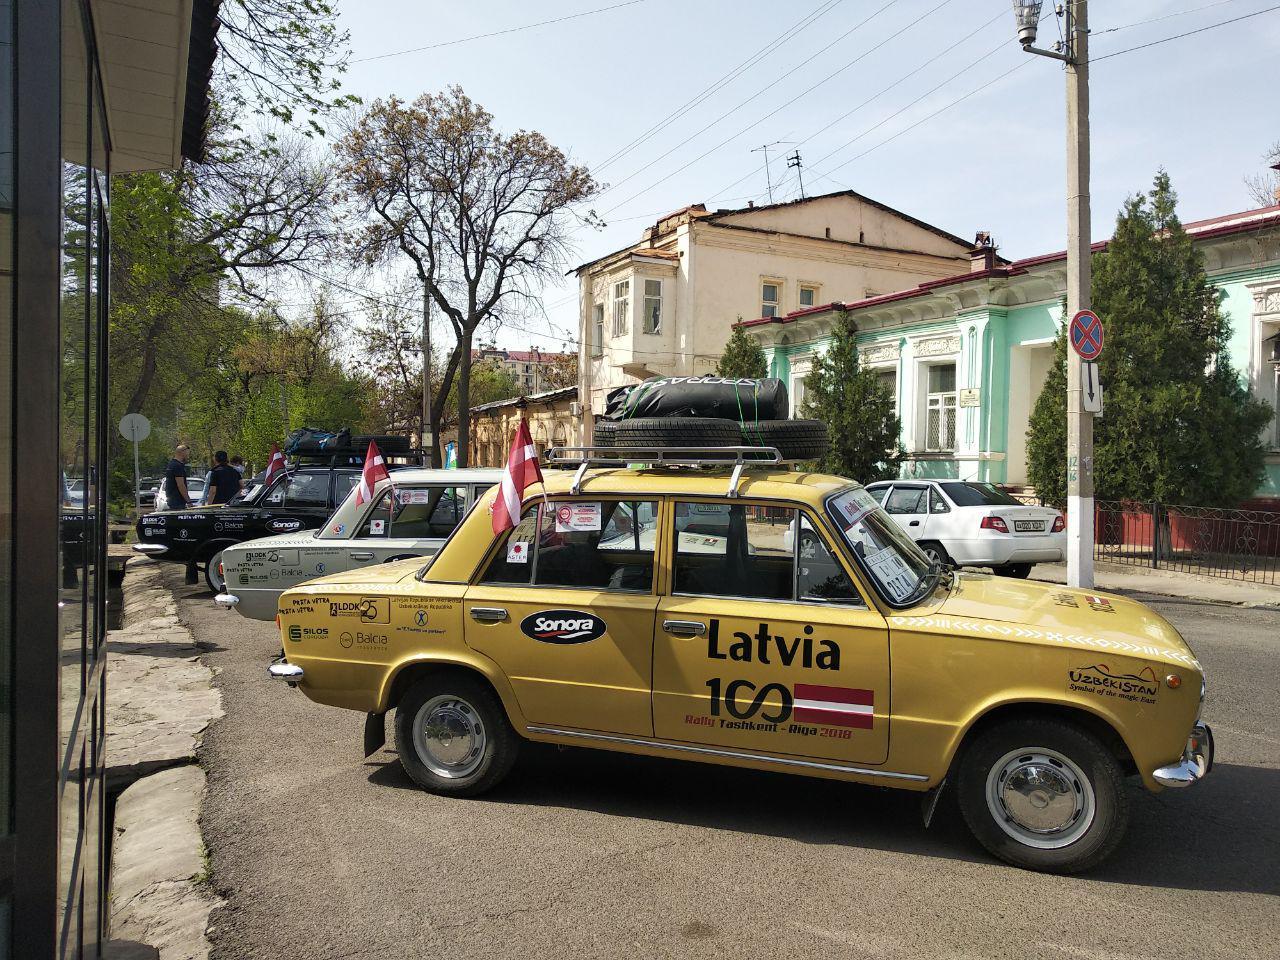 Стартовал автопробег Ташкент-Рига